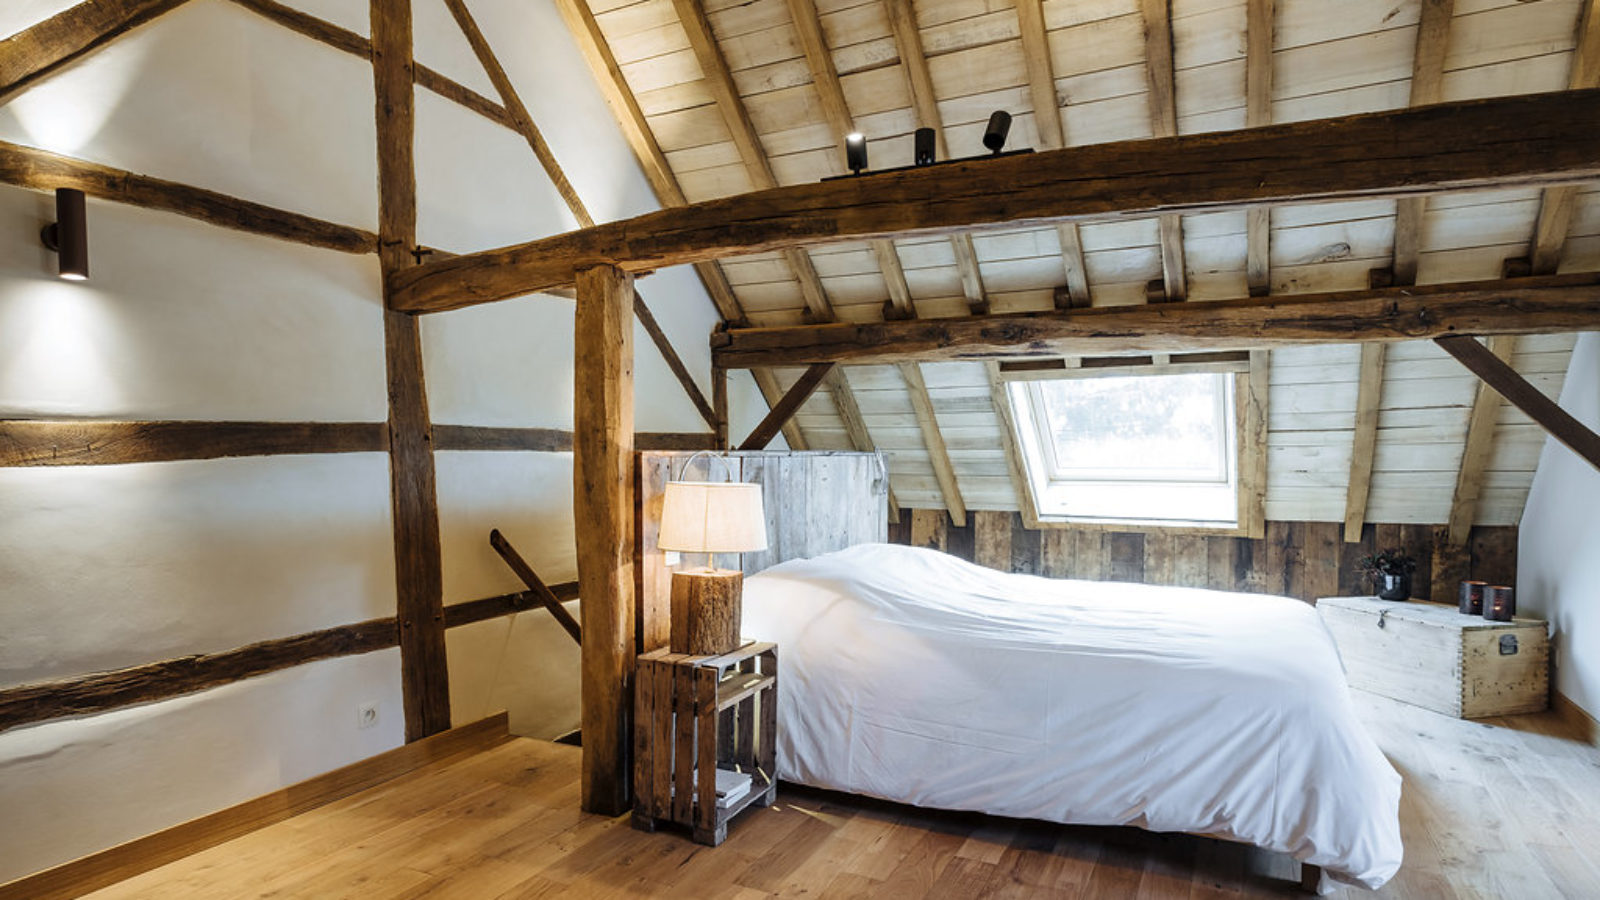 Chambre sous les toits g te du chapy - Chambre sous les toits ...